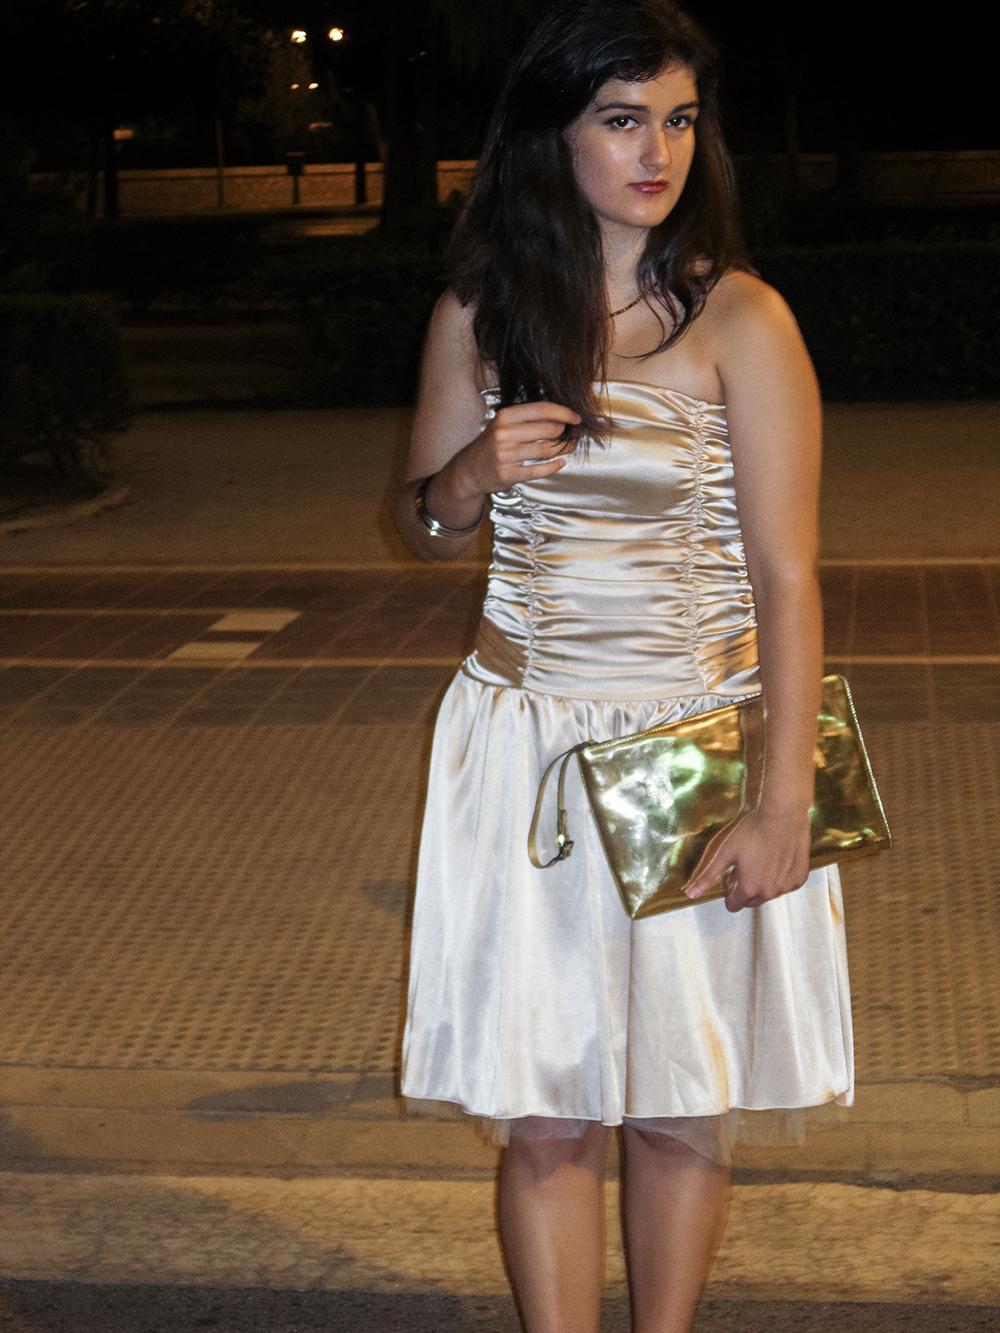 somethingfashion blogger valencia influencer spain_carolina herrera sandals_vintage dress beauty beast inspired 3